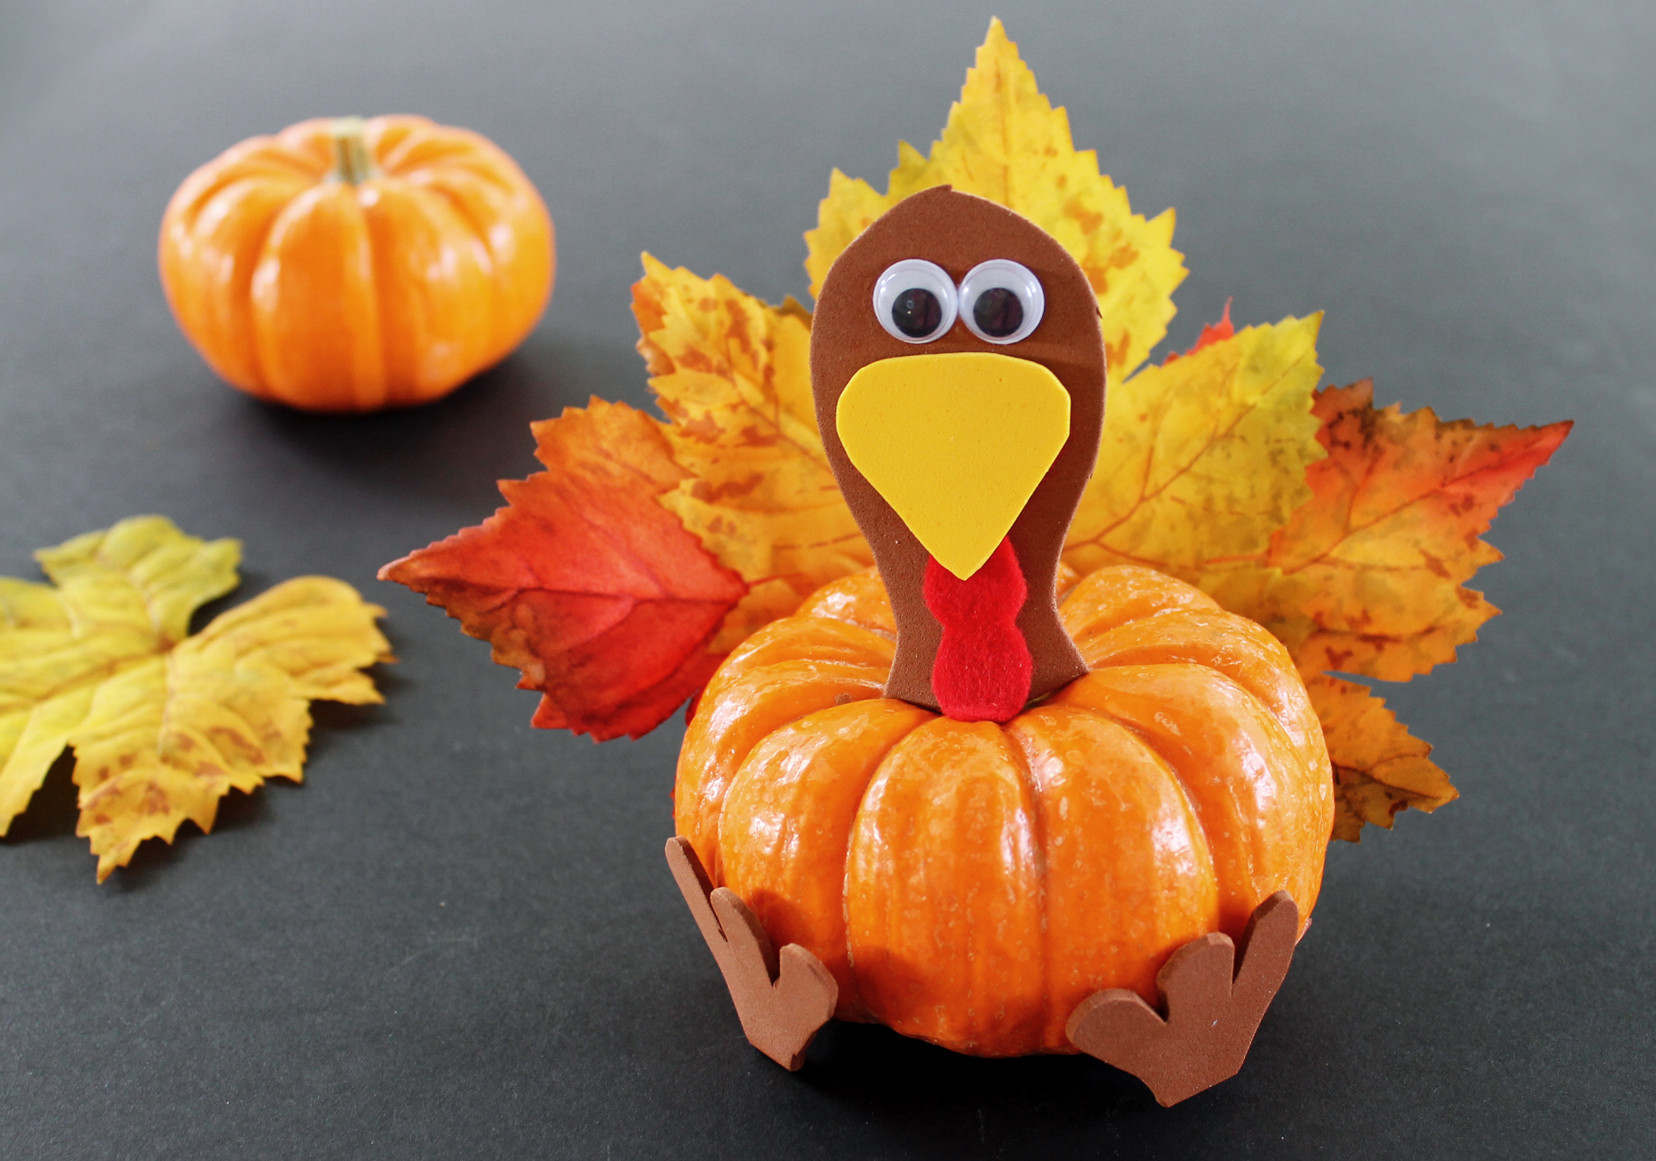 A Turkey For Thanksgiving Activities  Pumpkin Turkey Thanksgiving Craft for Kids Growing Up